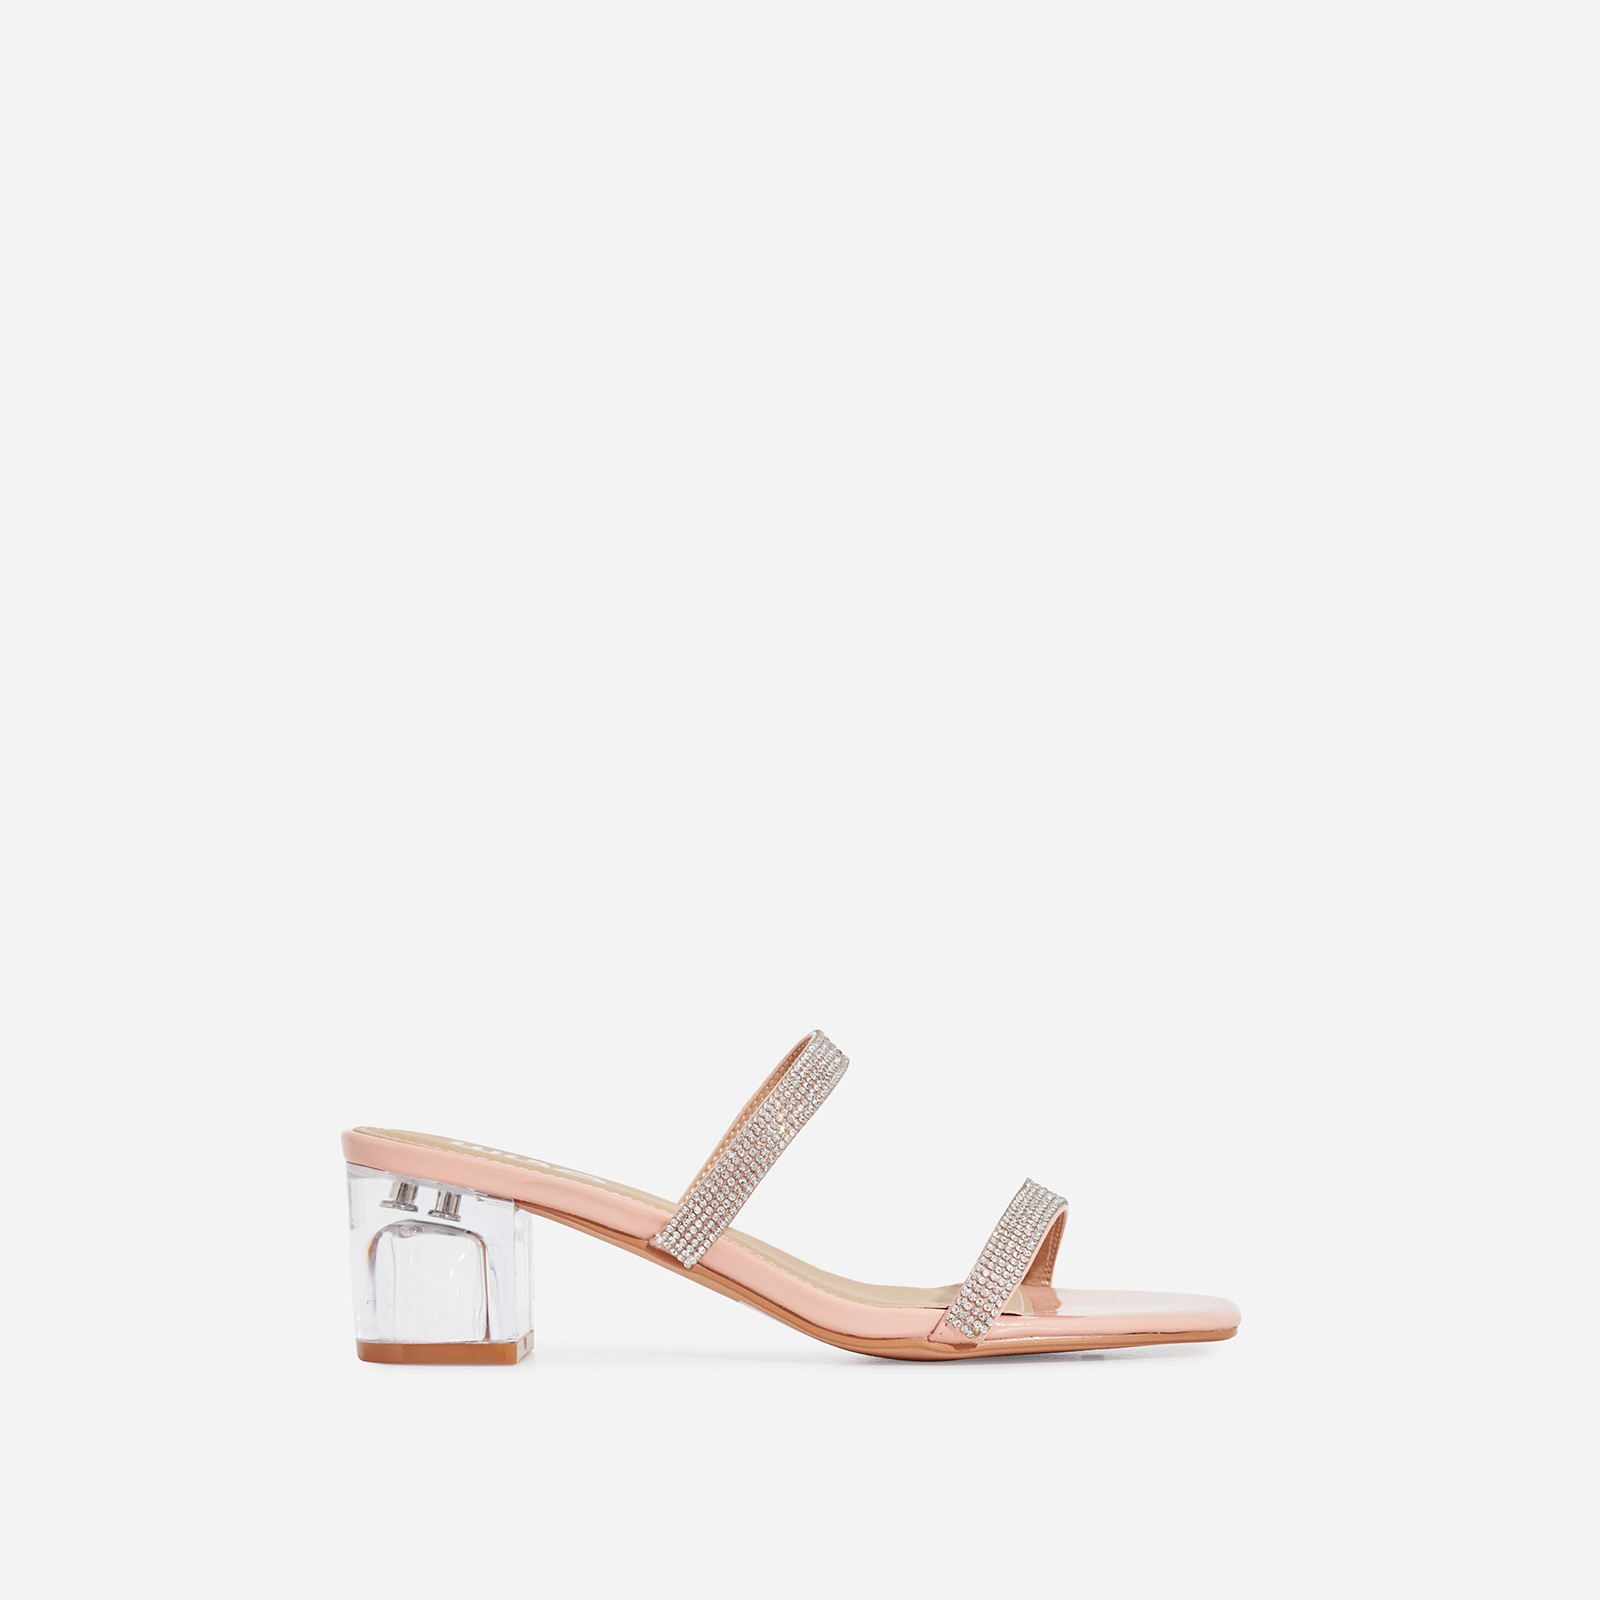 Cameo Diamante Detail Square Toe Perspex Midi Block Heel Mule In Nude Patent